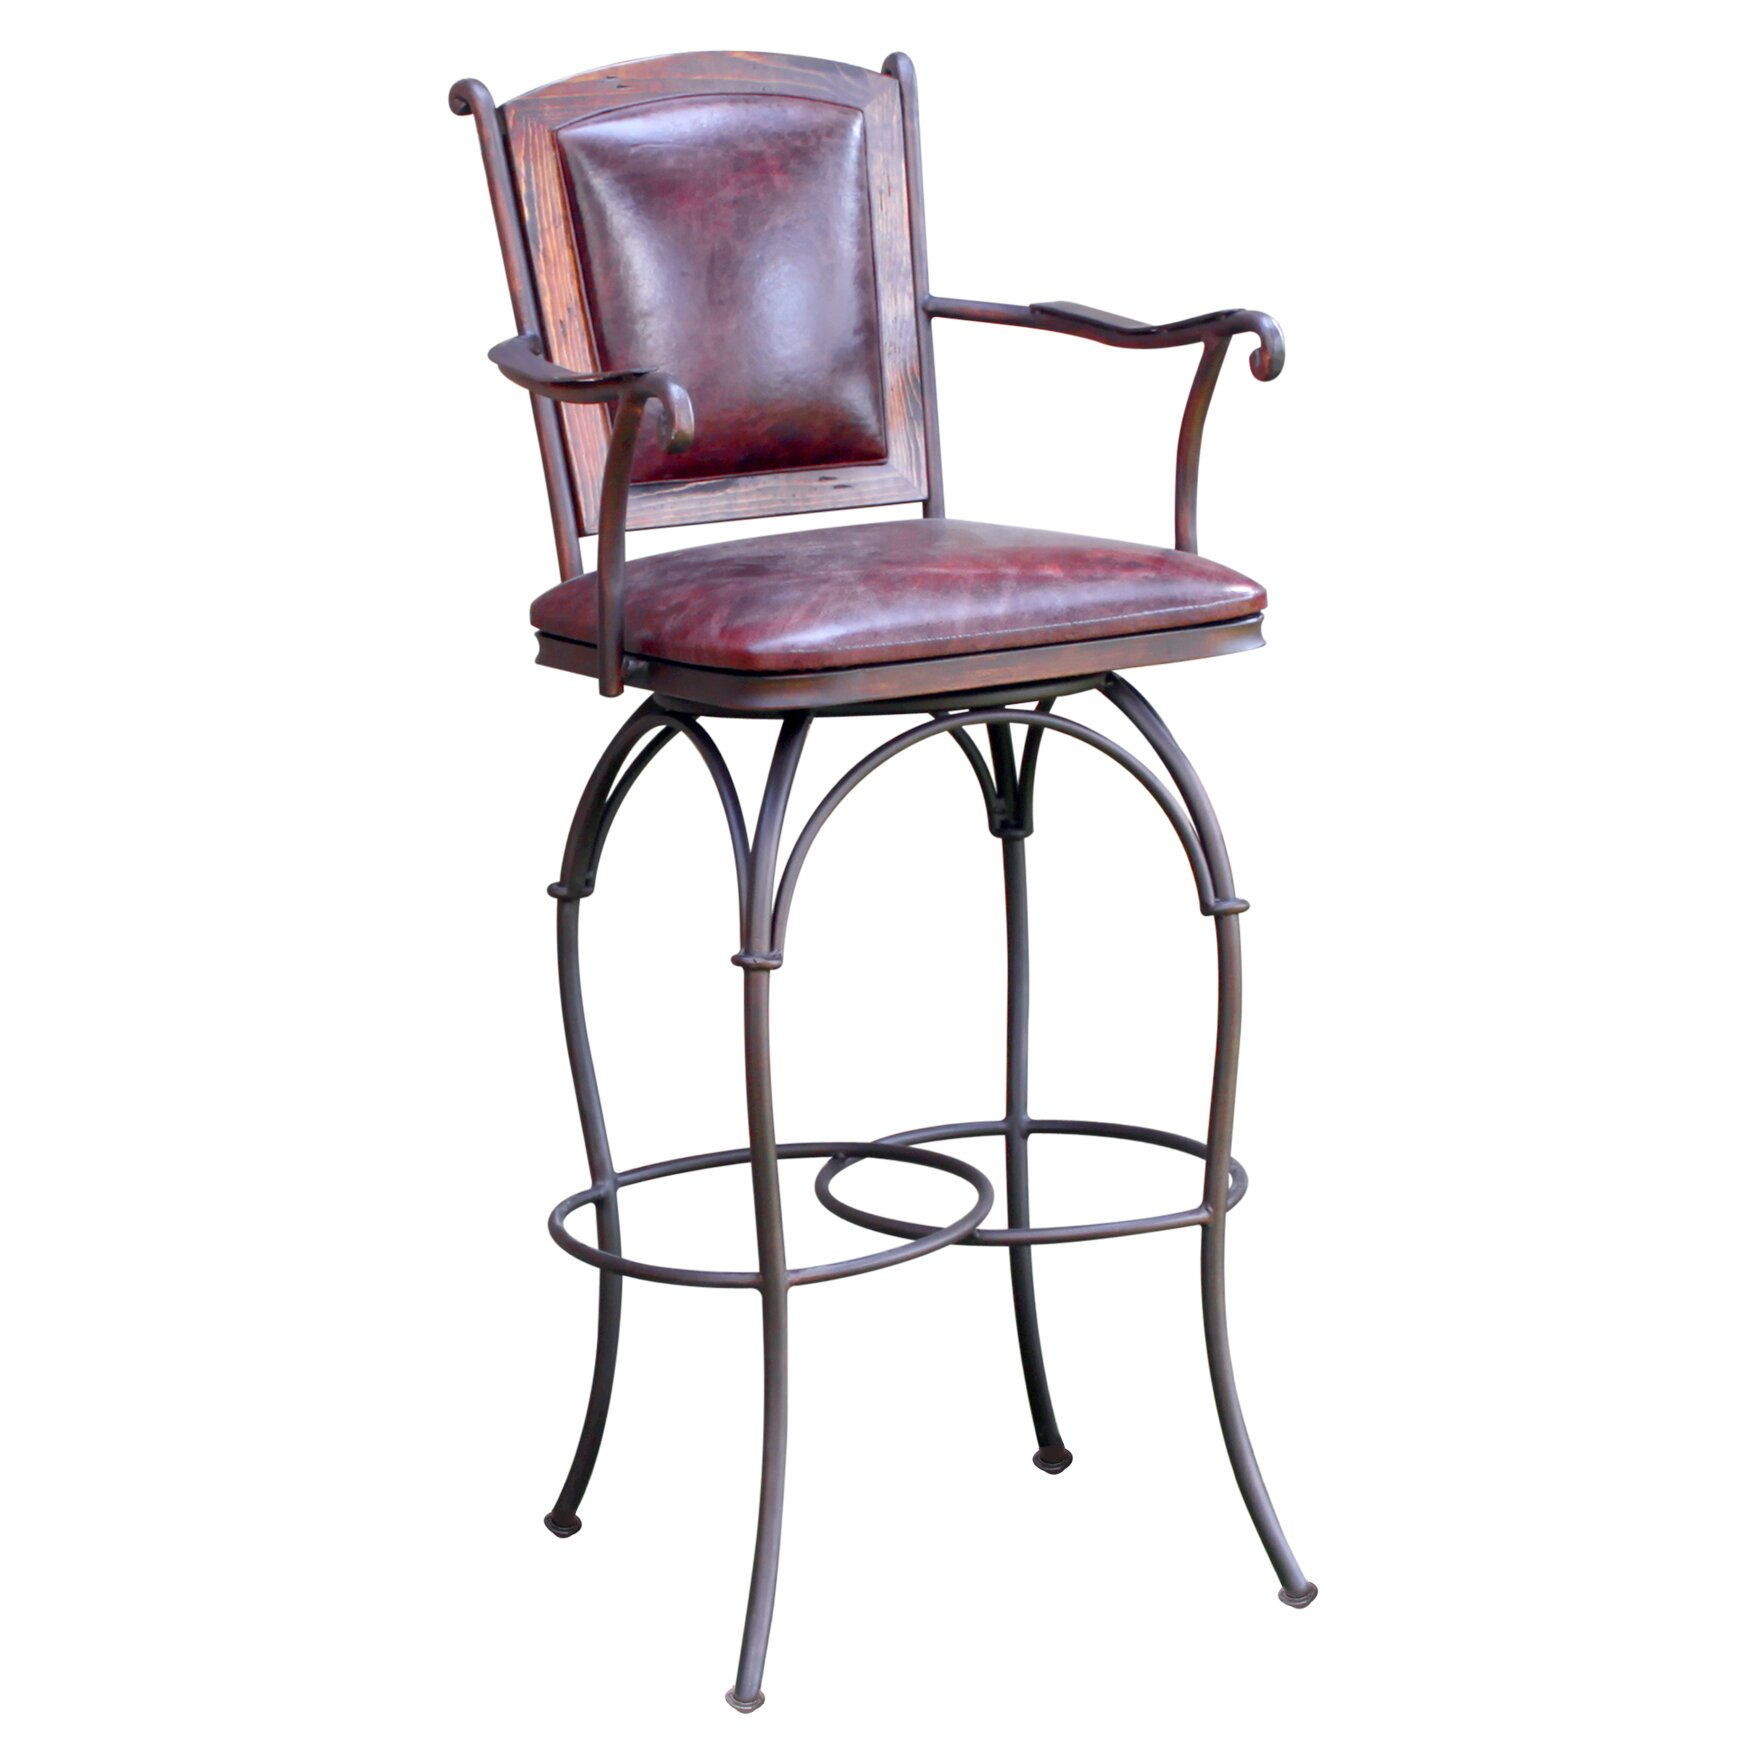 Artisan Home Furniture 30 Swivel Bar Stool With Cushion Reviews Wayfair